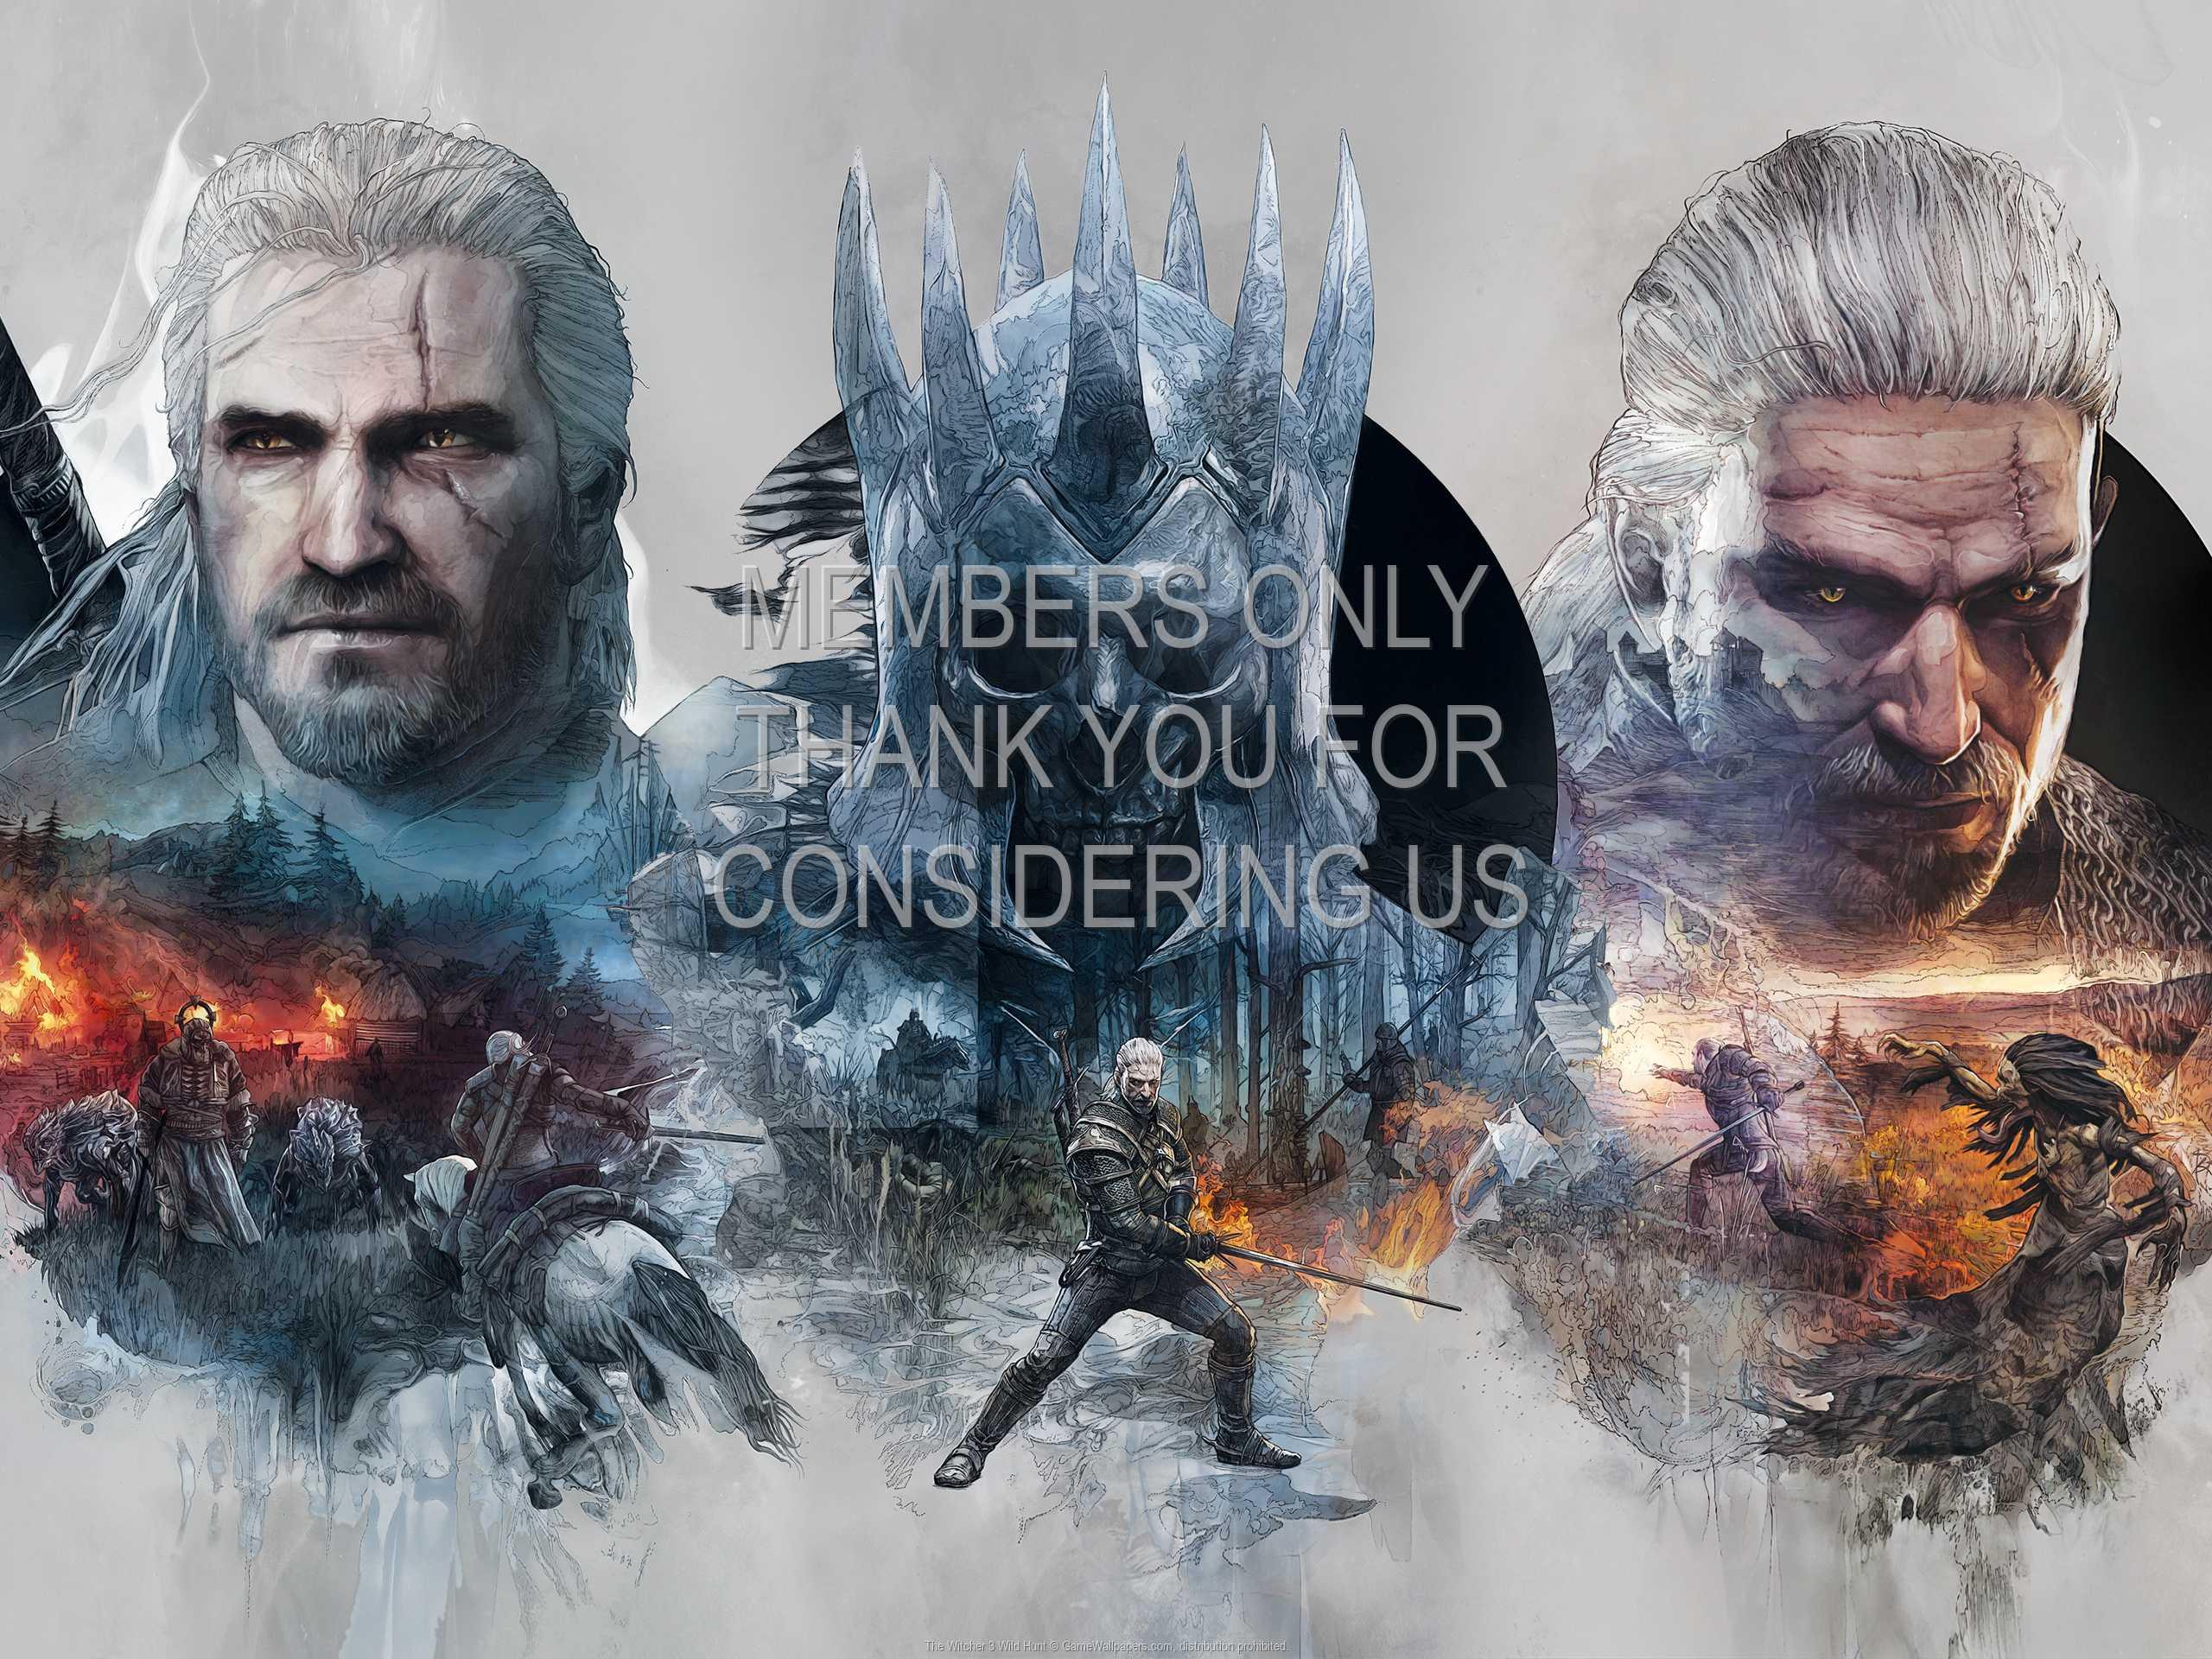 The Witcher 3: Wild Hunt 1080p Horizontal Handy Hintergrundbild 21